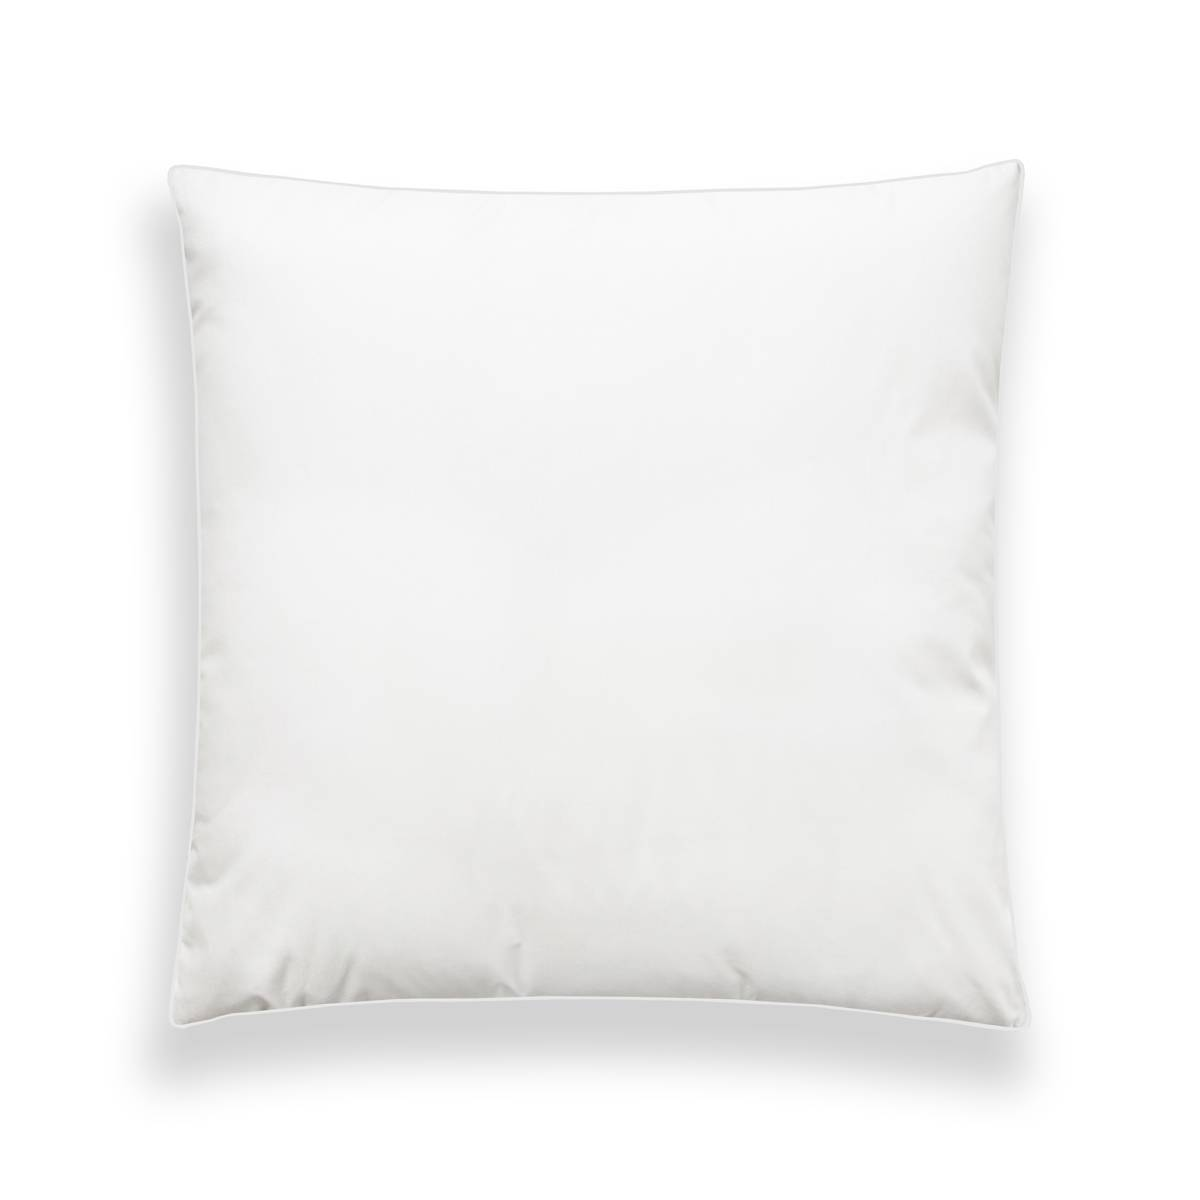 WAKE ME GREEN Oreiller MEDIUM 30% Duvet Anti-acariens - Coton Bio  65x65 cm